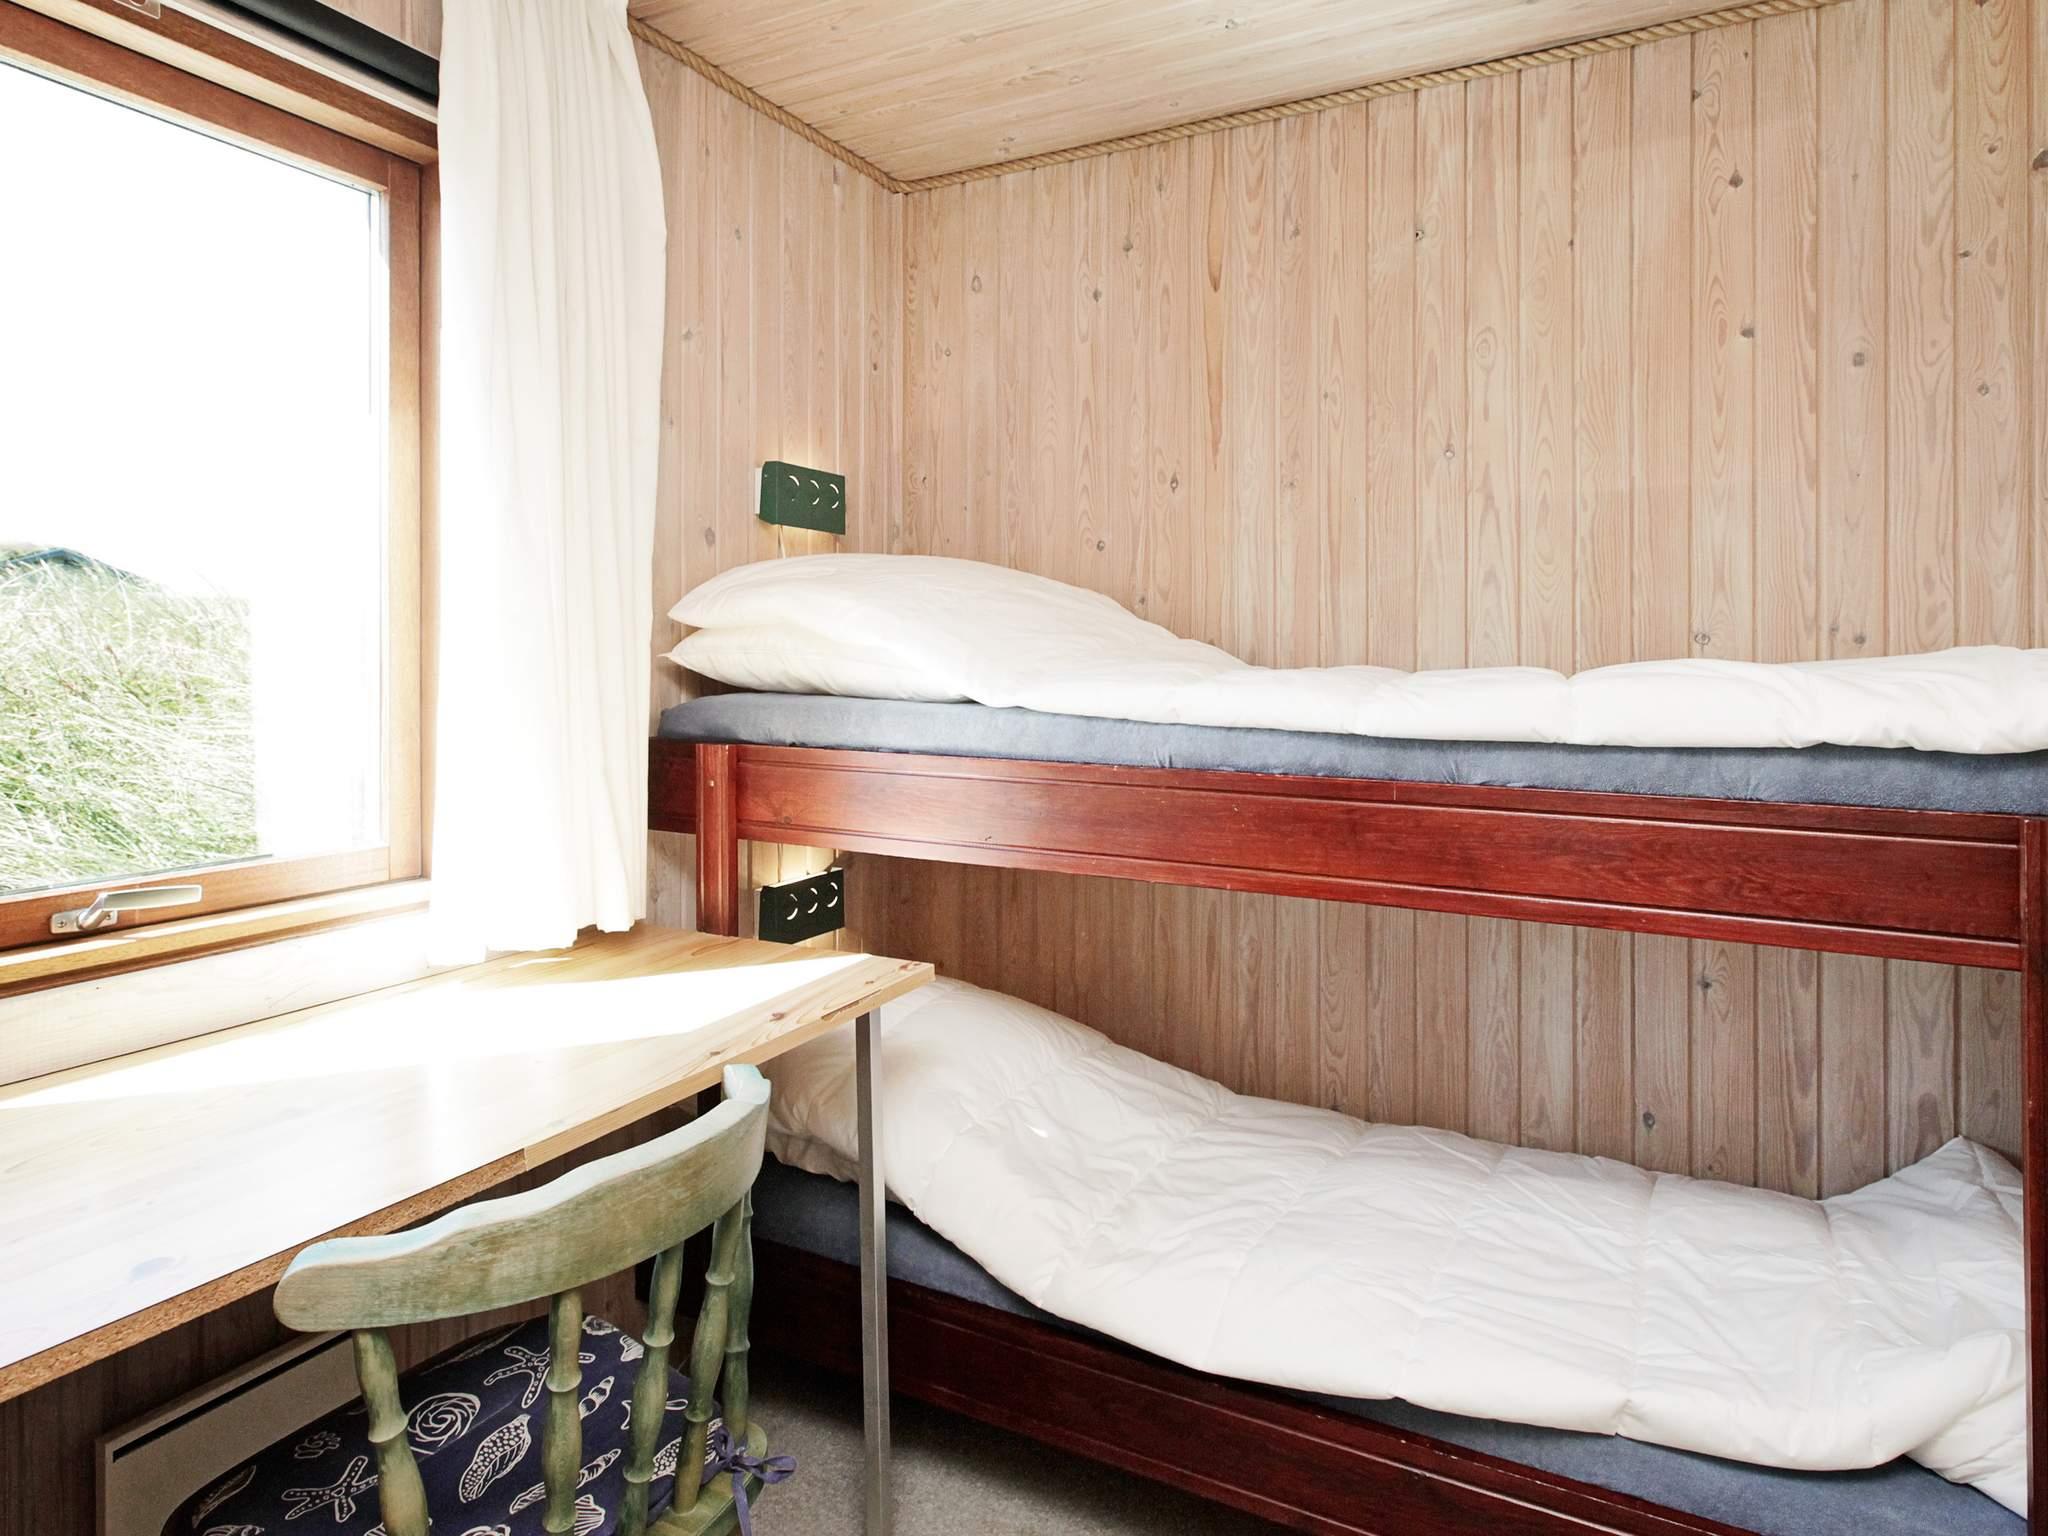 Ferienhaus Grønhøj Strand (83808), Løkken, , Nordwestjütland, Dänemark, Bild 13